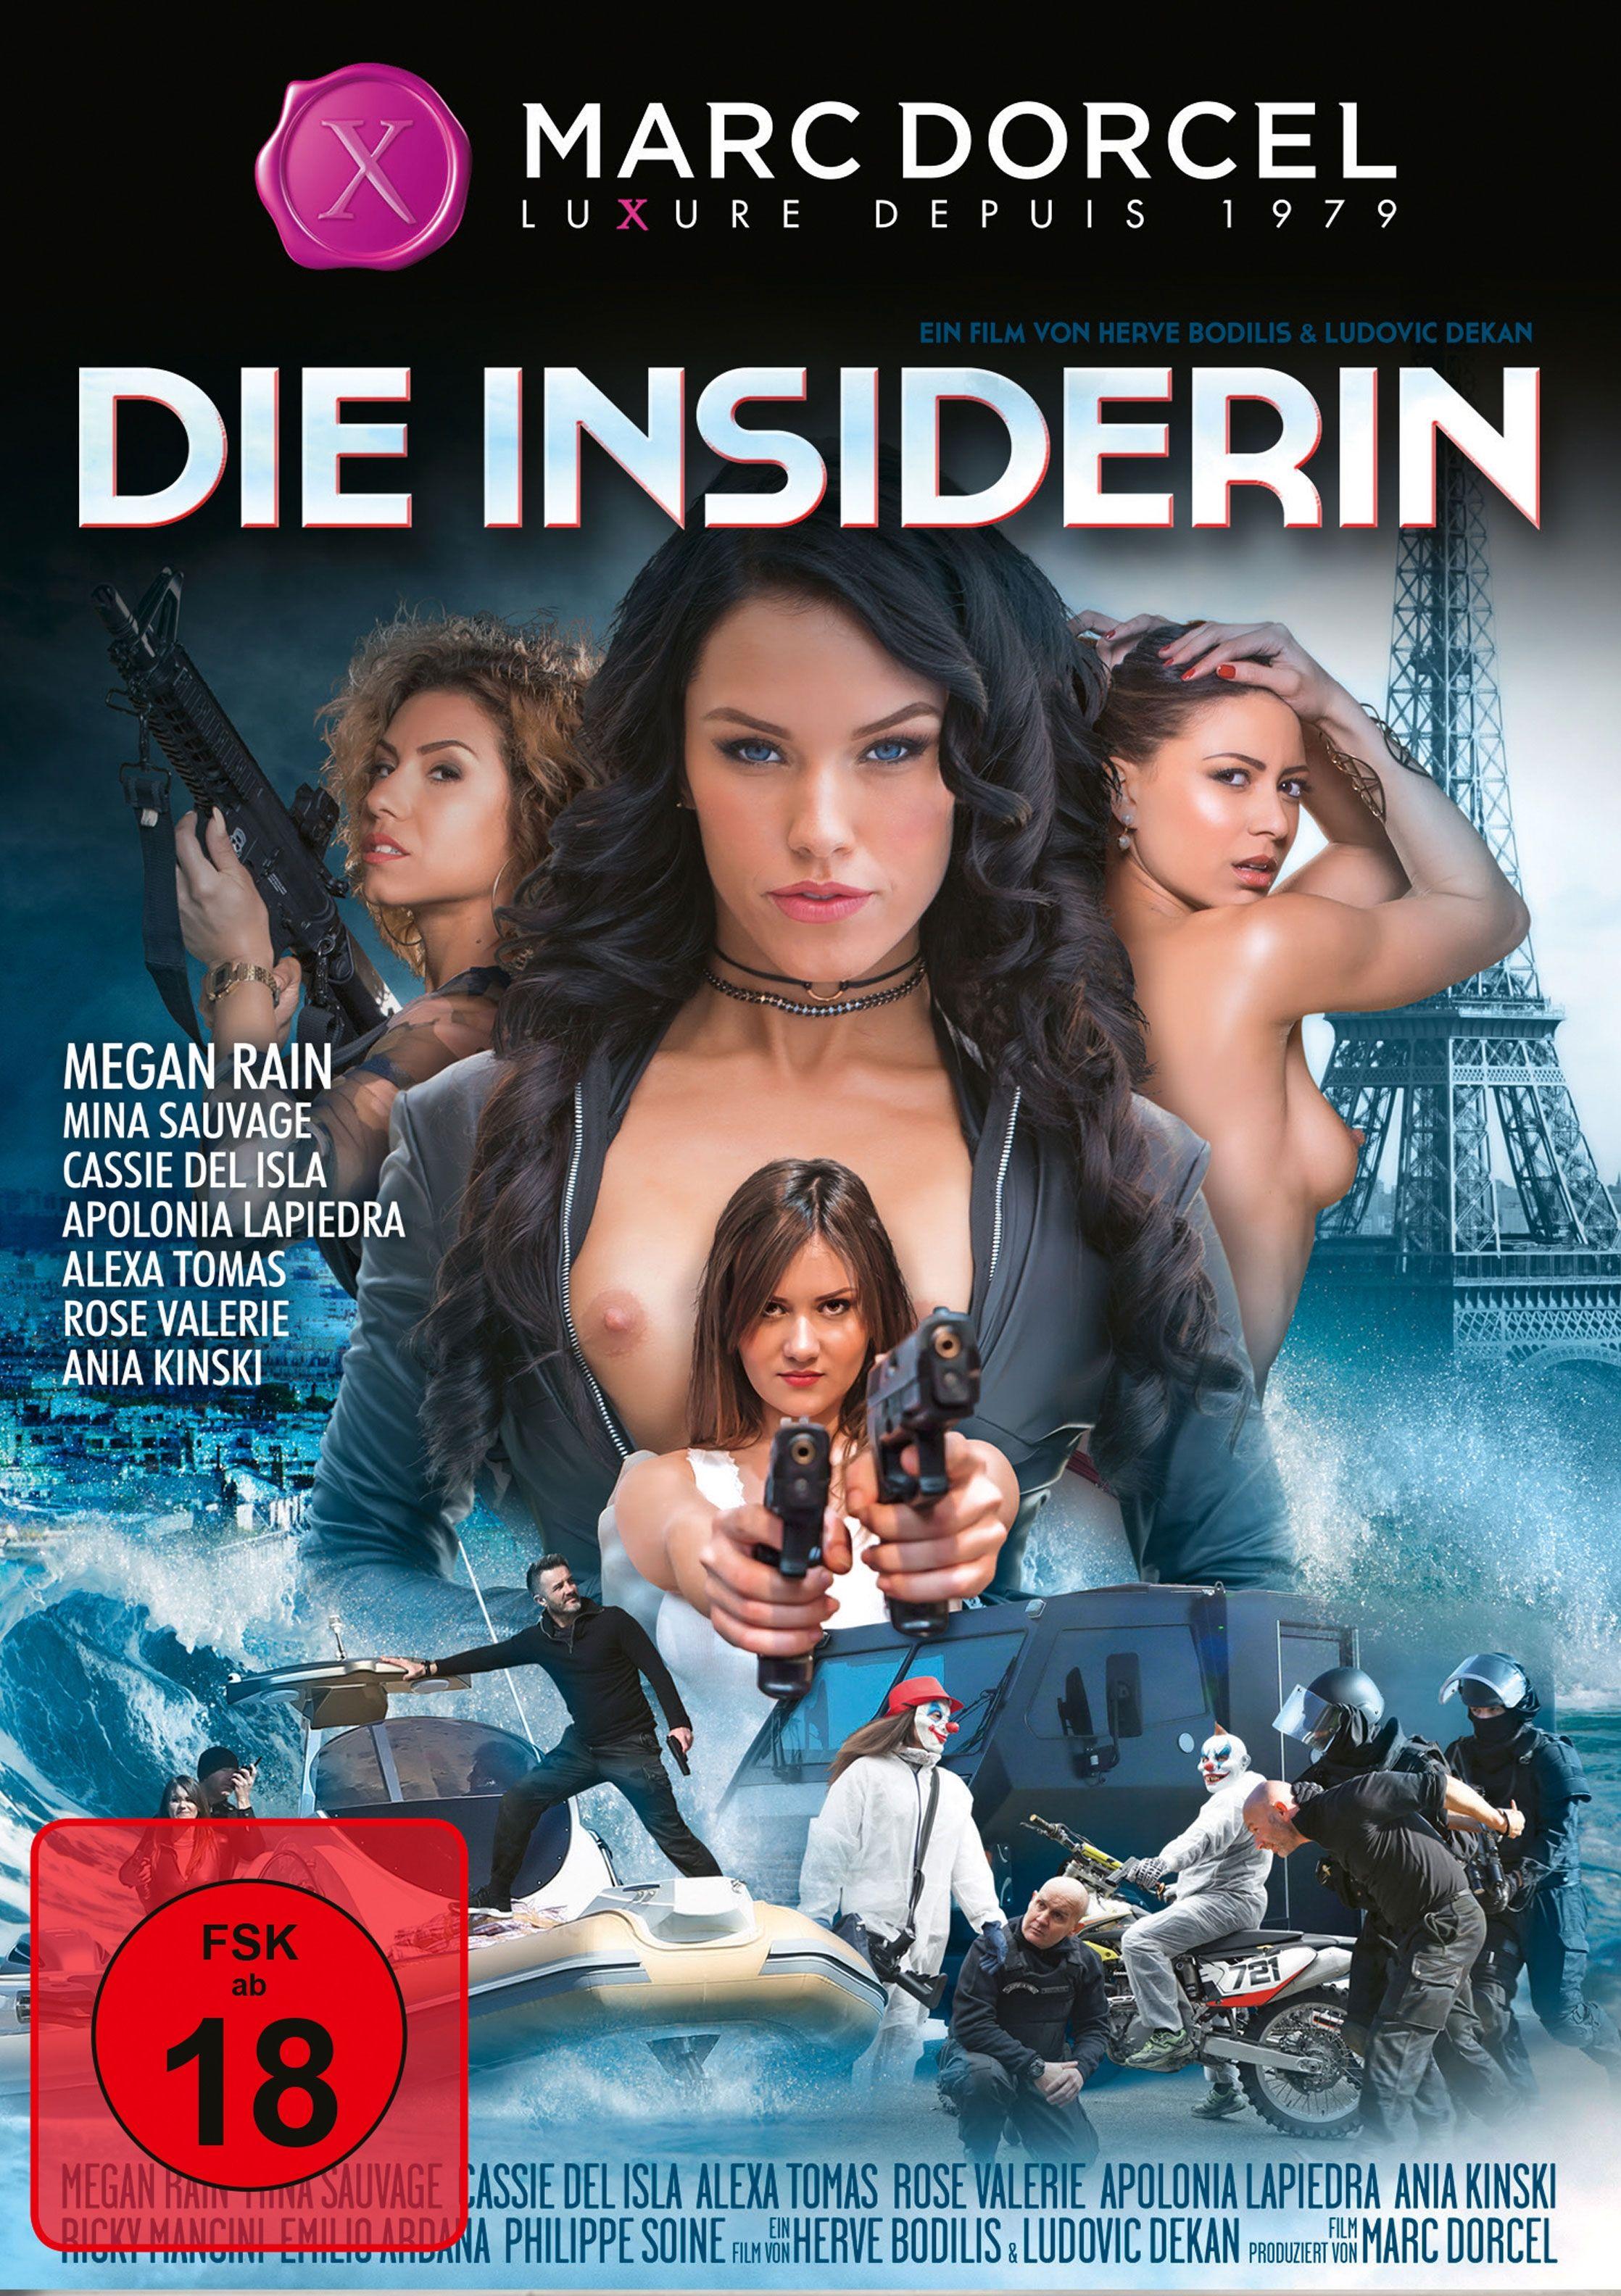 Insiderin, Die